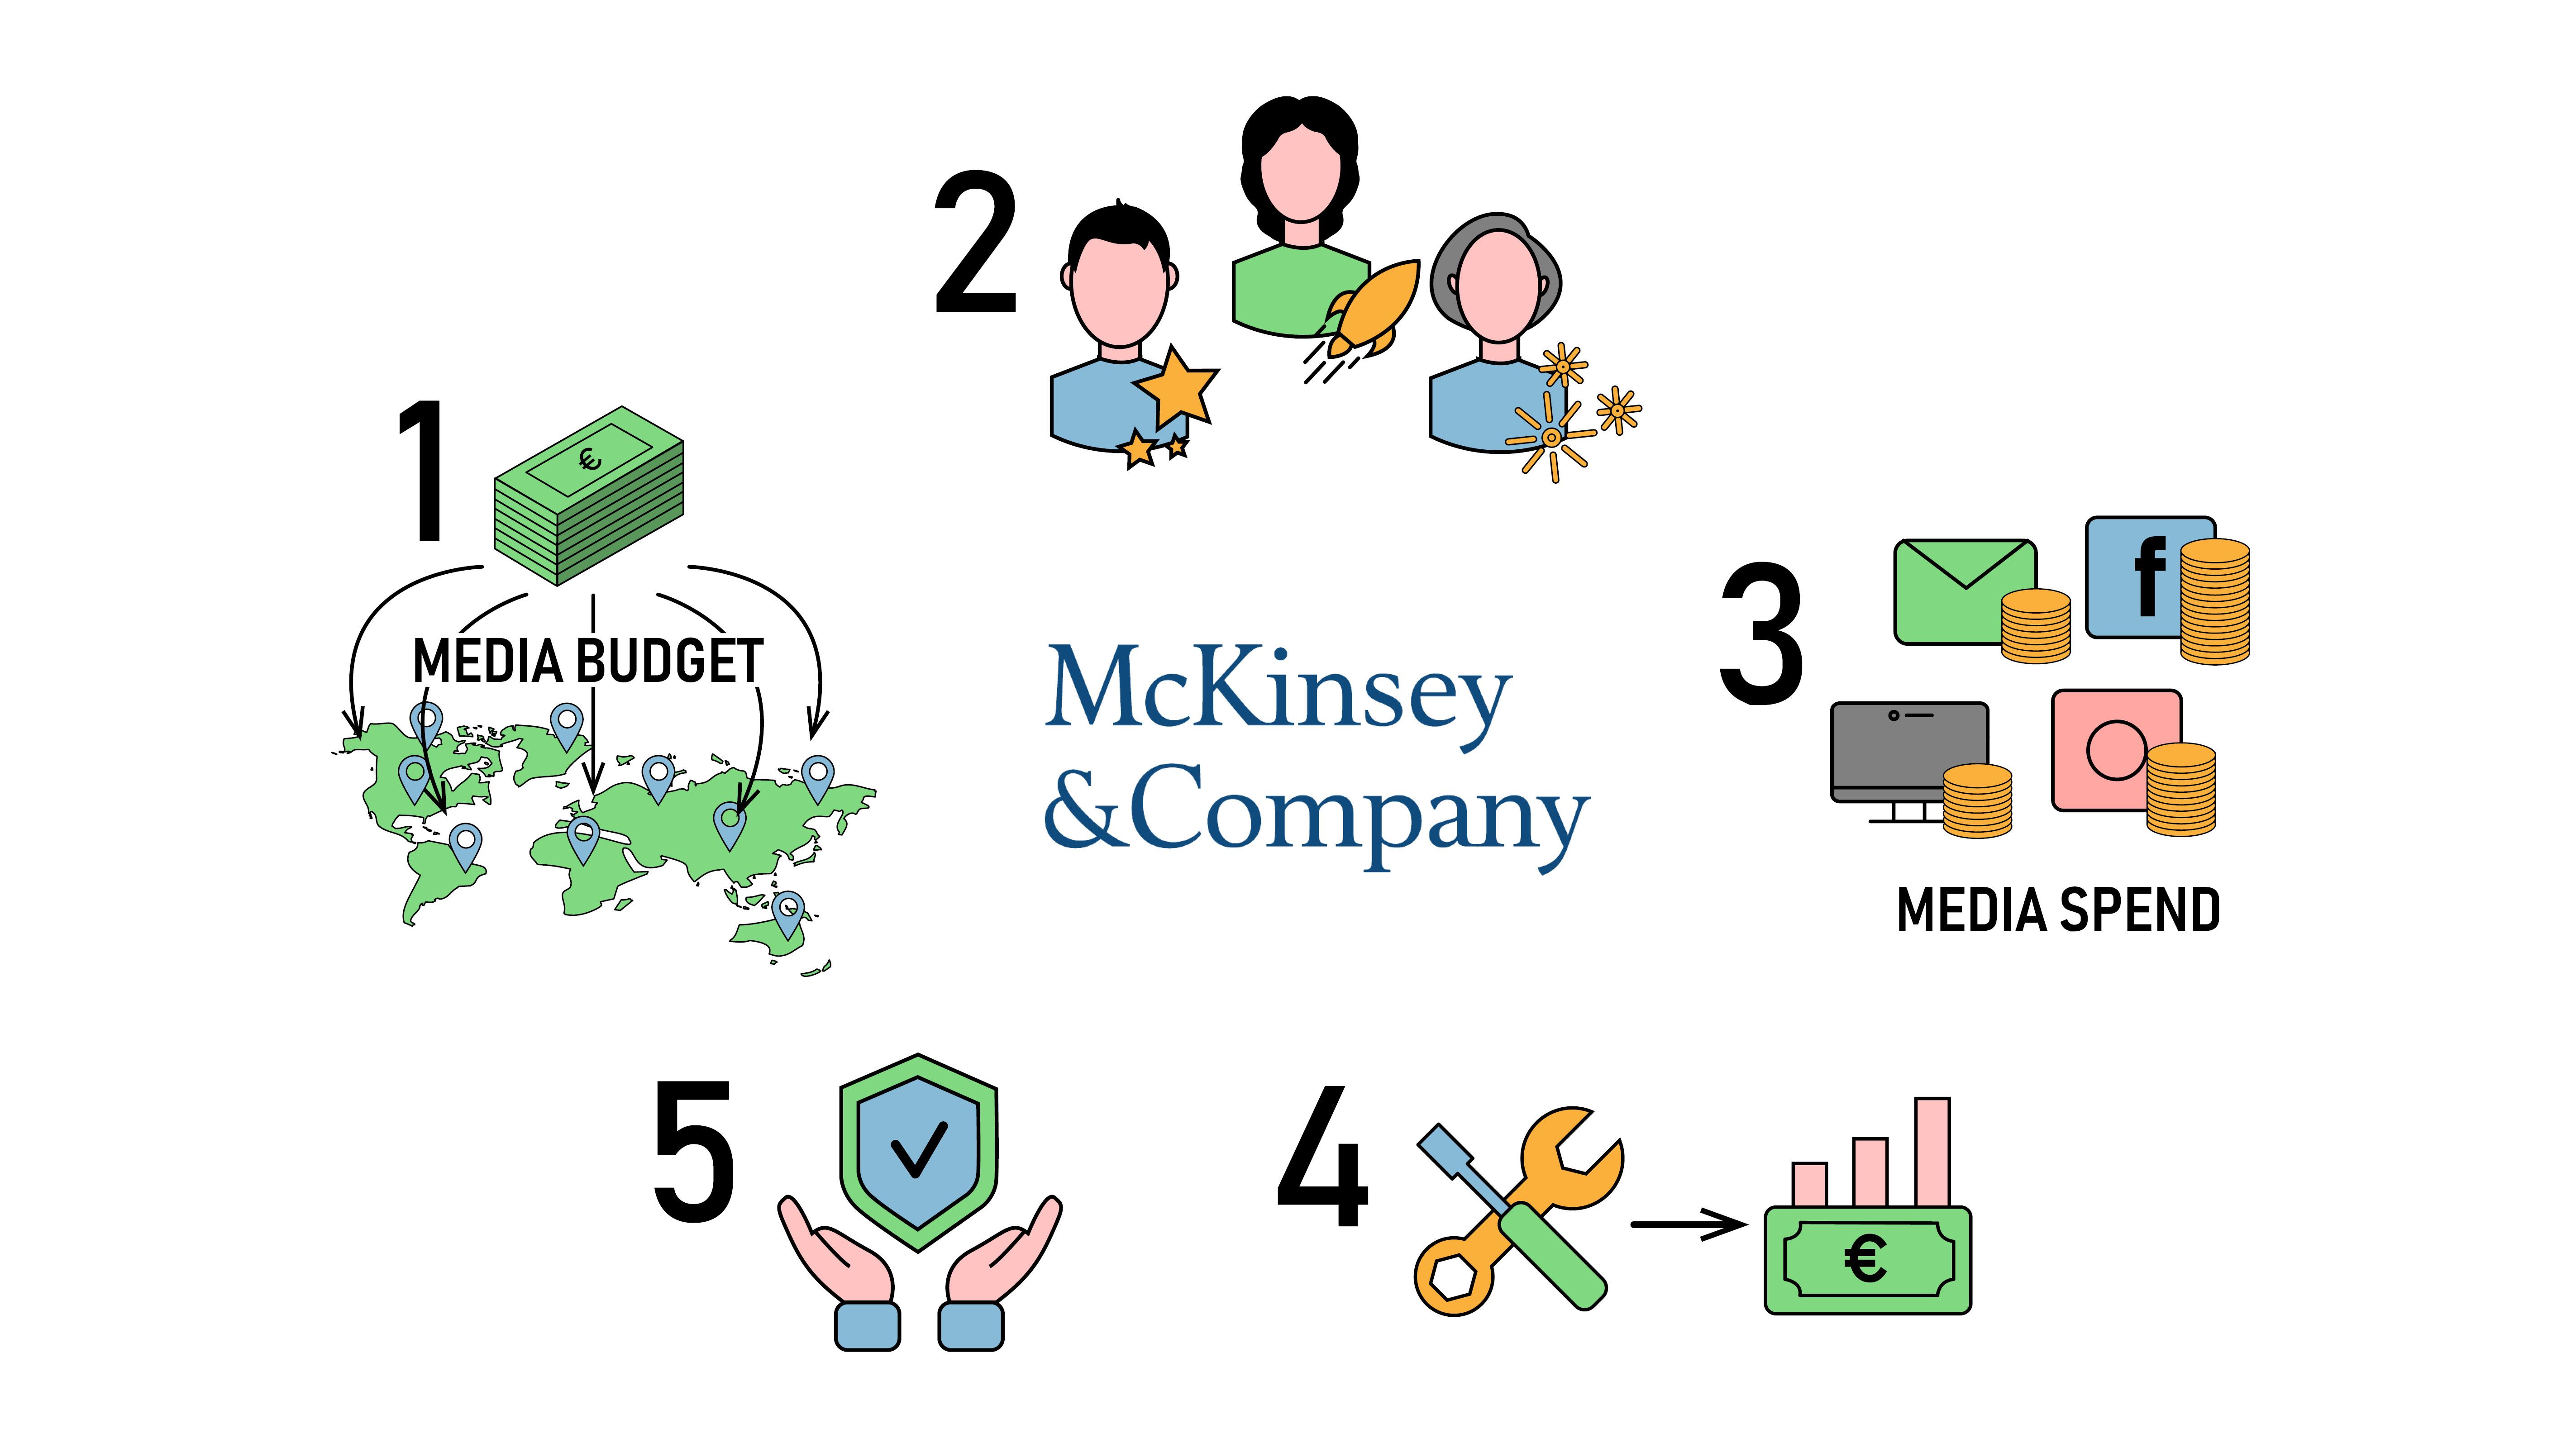 MROI, ROMI, media budget, media spend, Media Mix Optimisation, advertising channels